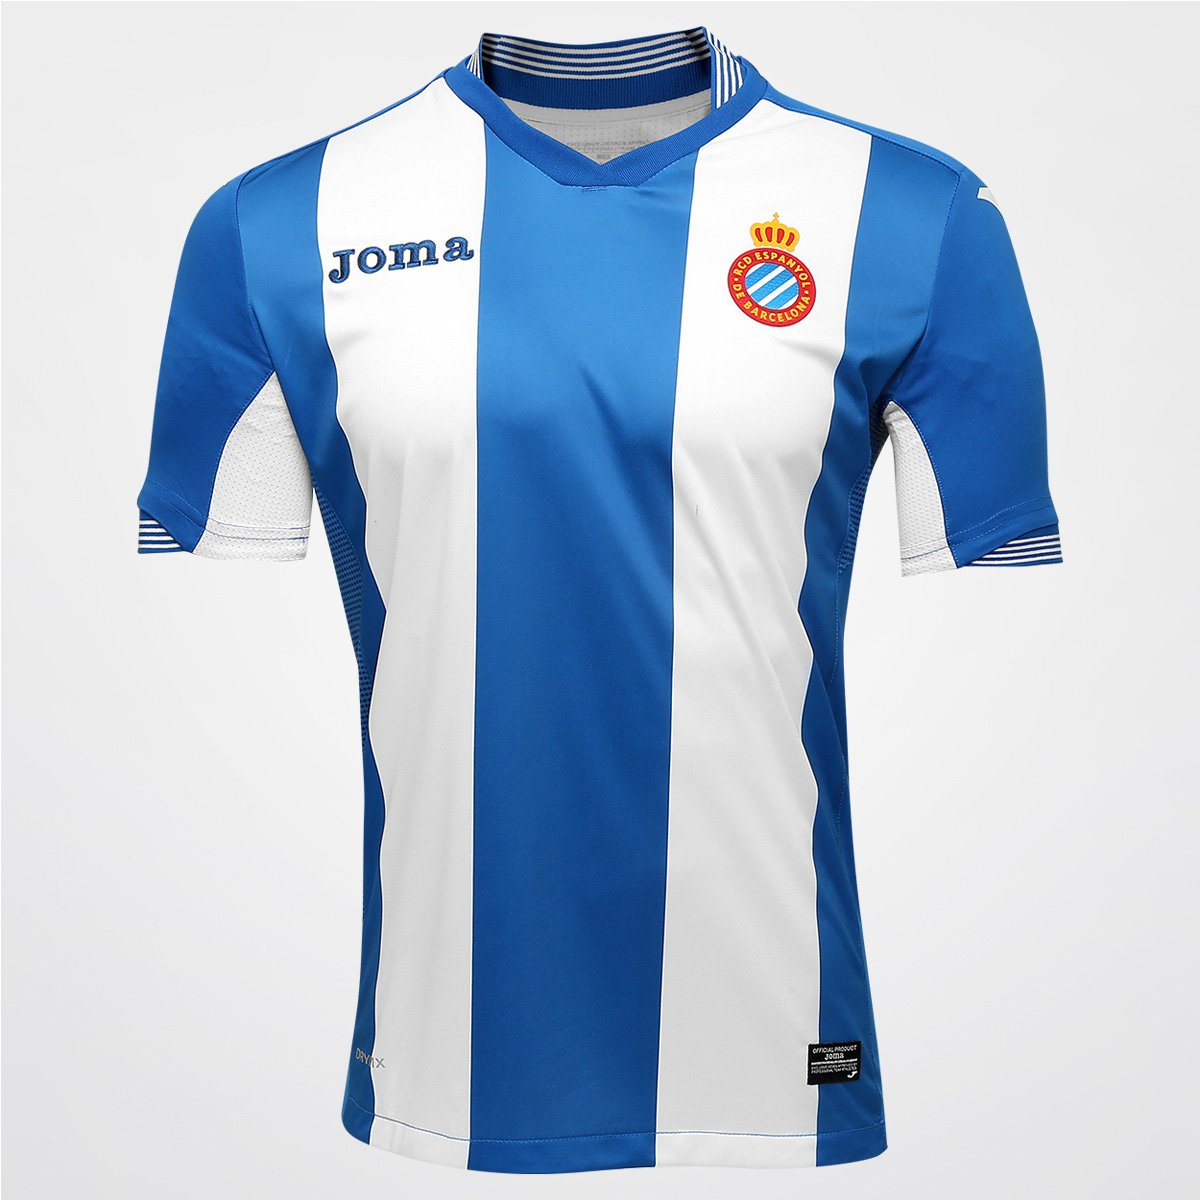 Camisa Espanyol Home 15 16 s nº - Torcedor Joma Masculina - Compre Agora  1a03ad8e9e891